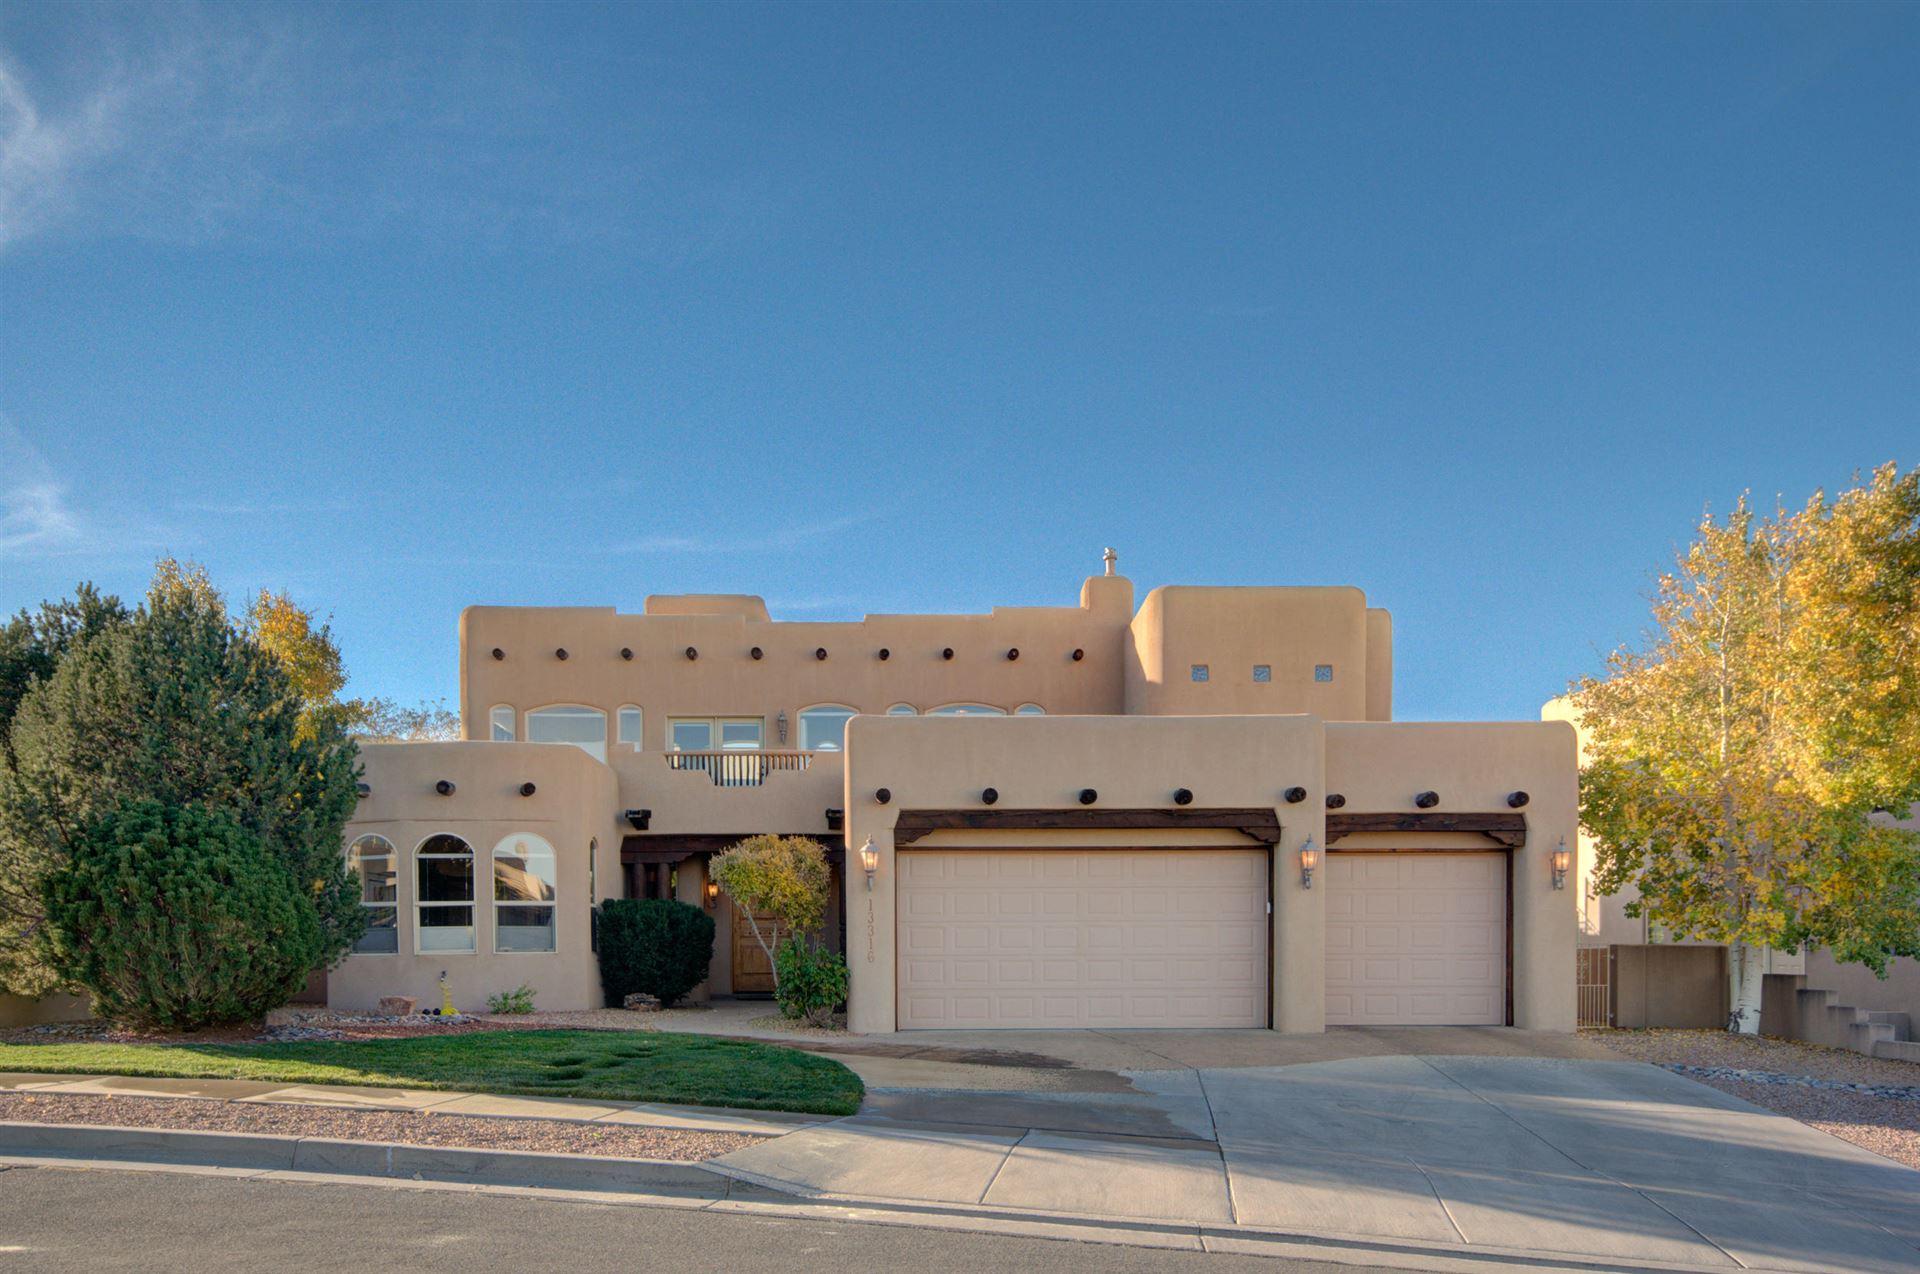 Photo for 13316 Twilight Trail Place NE, Albuquerque, NM 87111 (MLS # 980196)